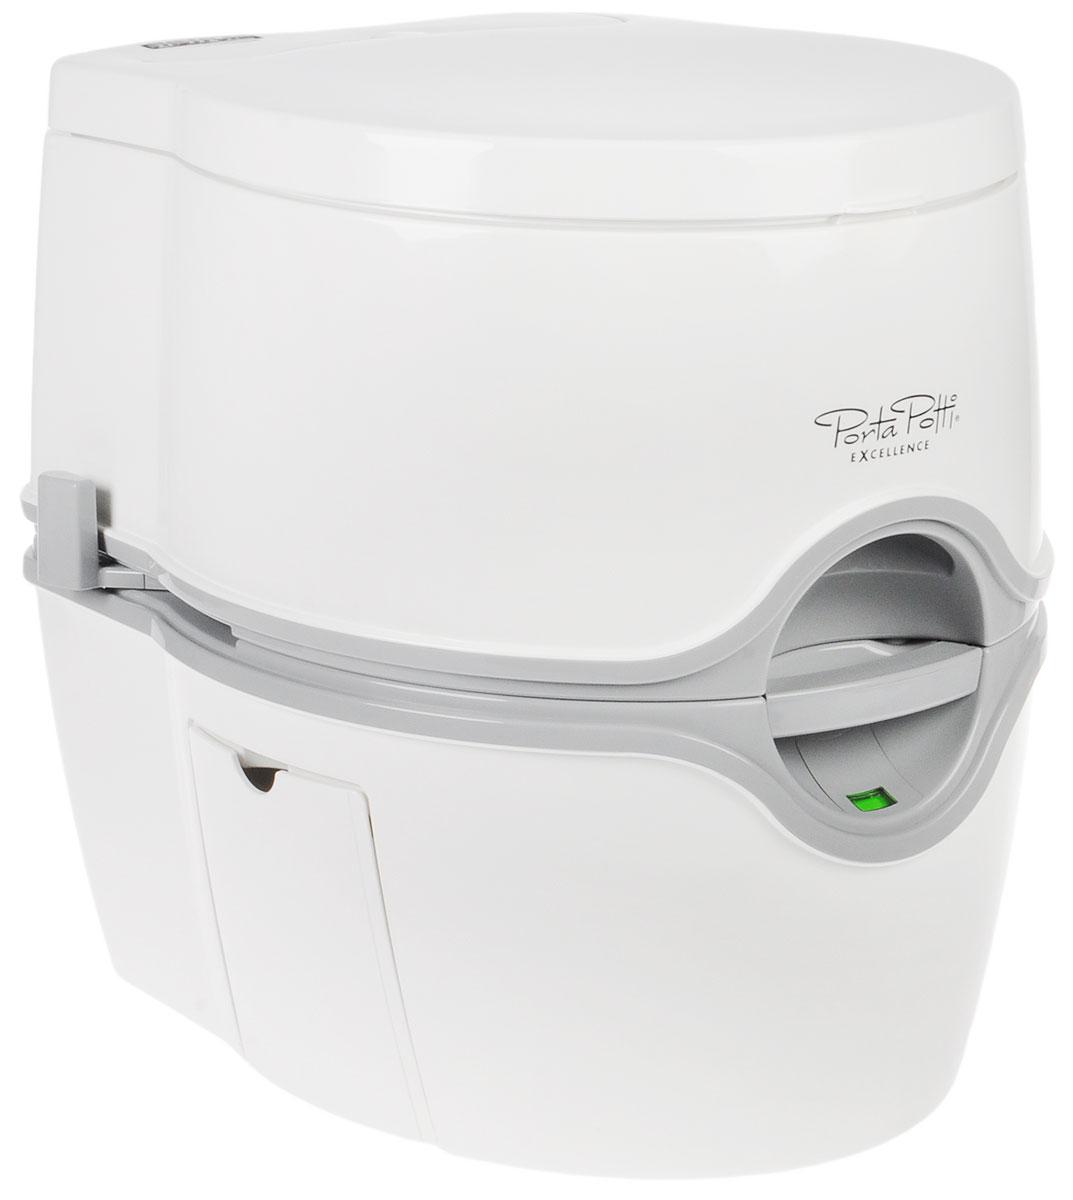 "Биотуалет Thetford ""Porta Potti Excellence Electric"", цвет: белый EXC+ (92320)"